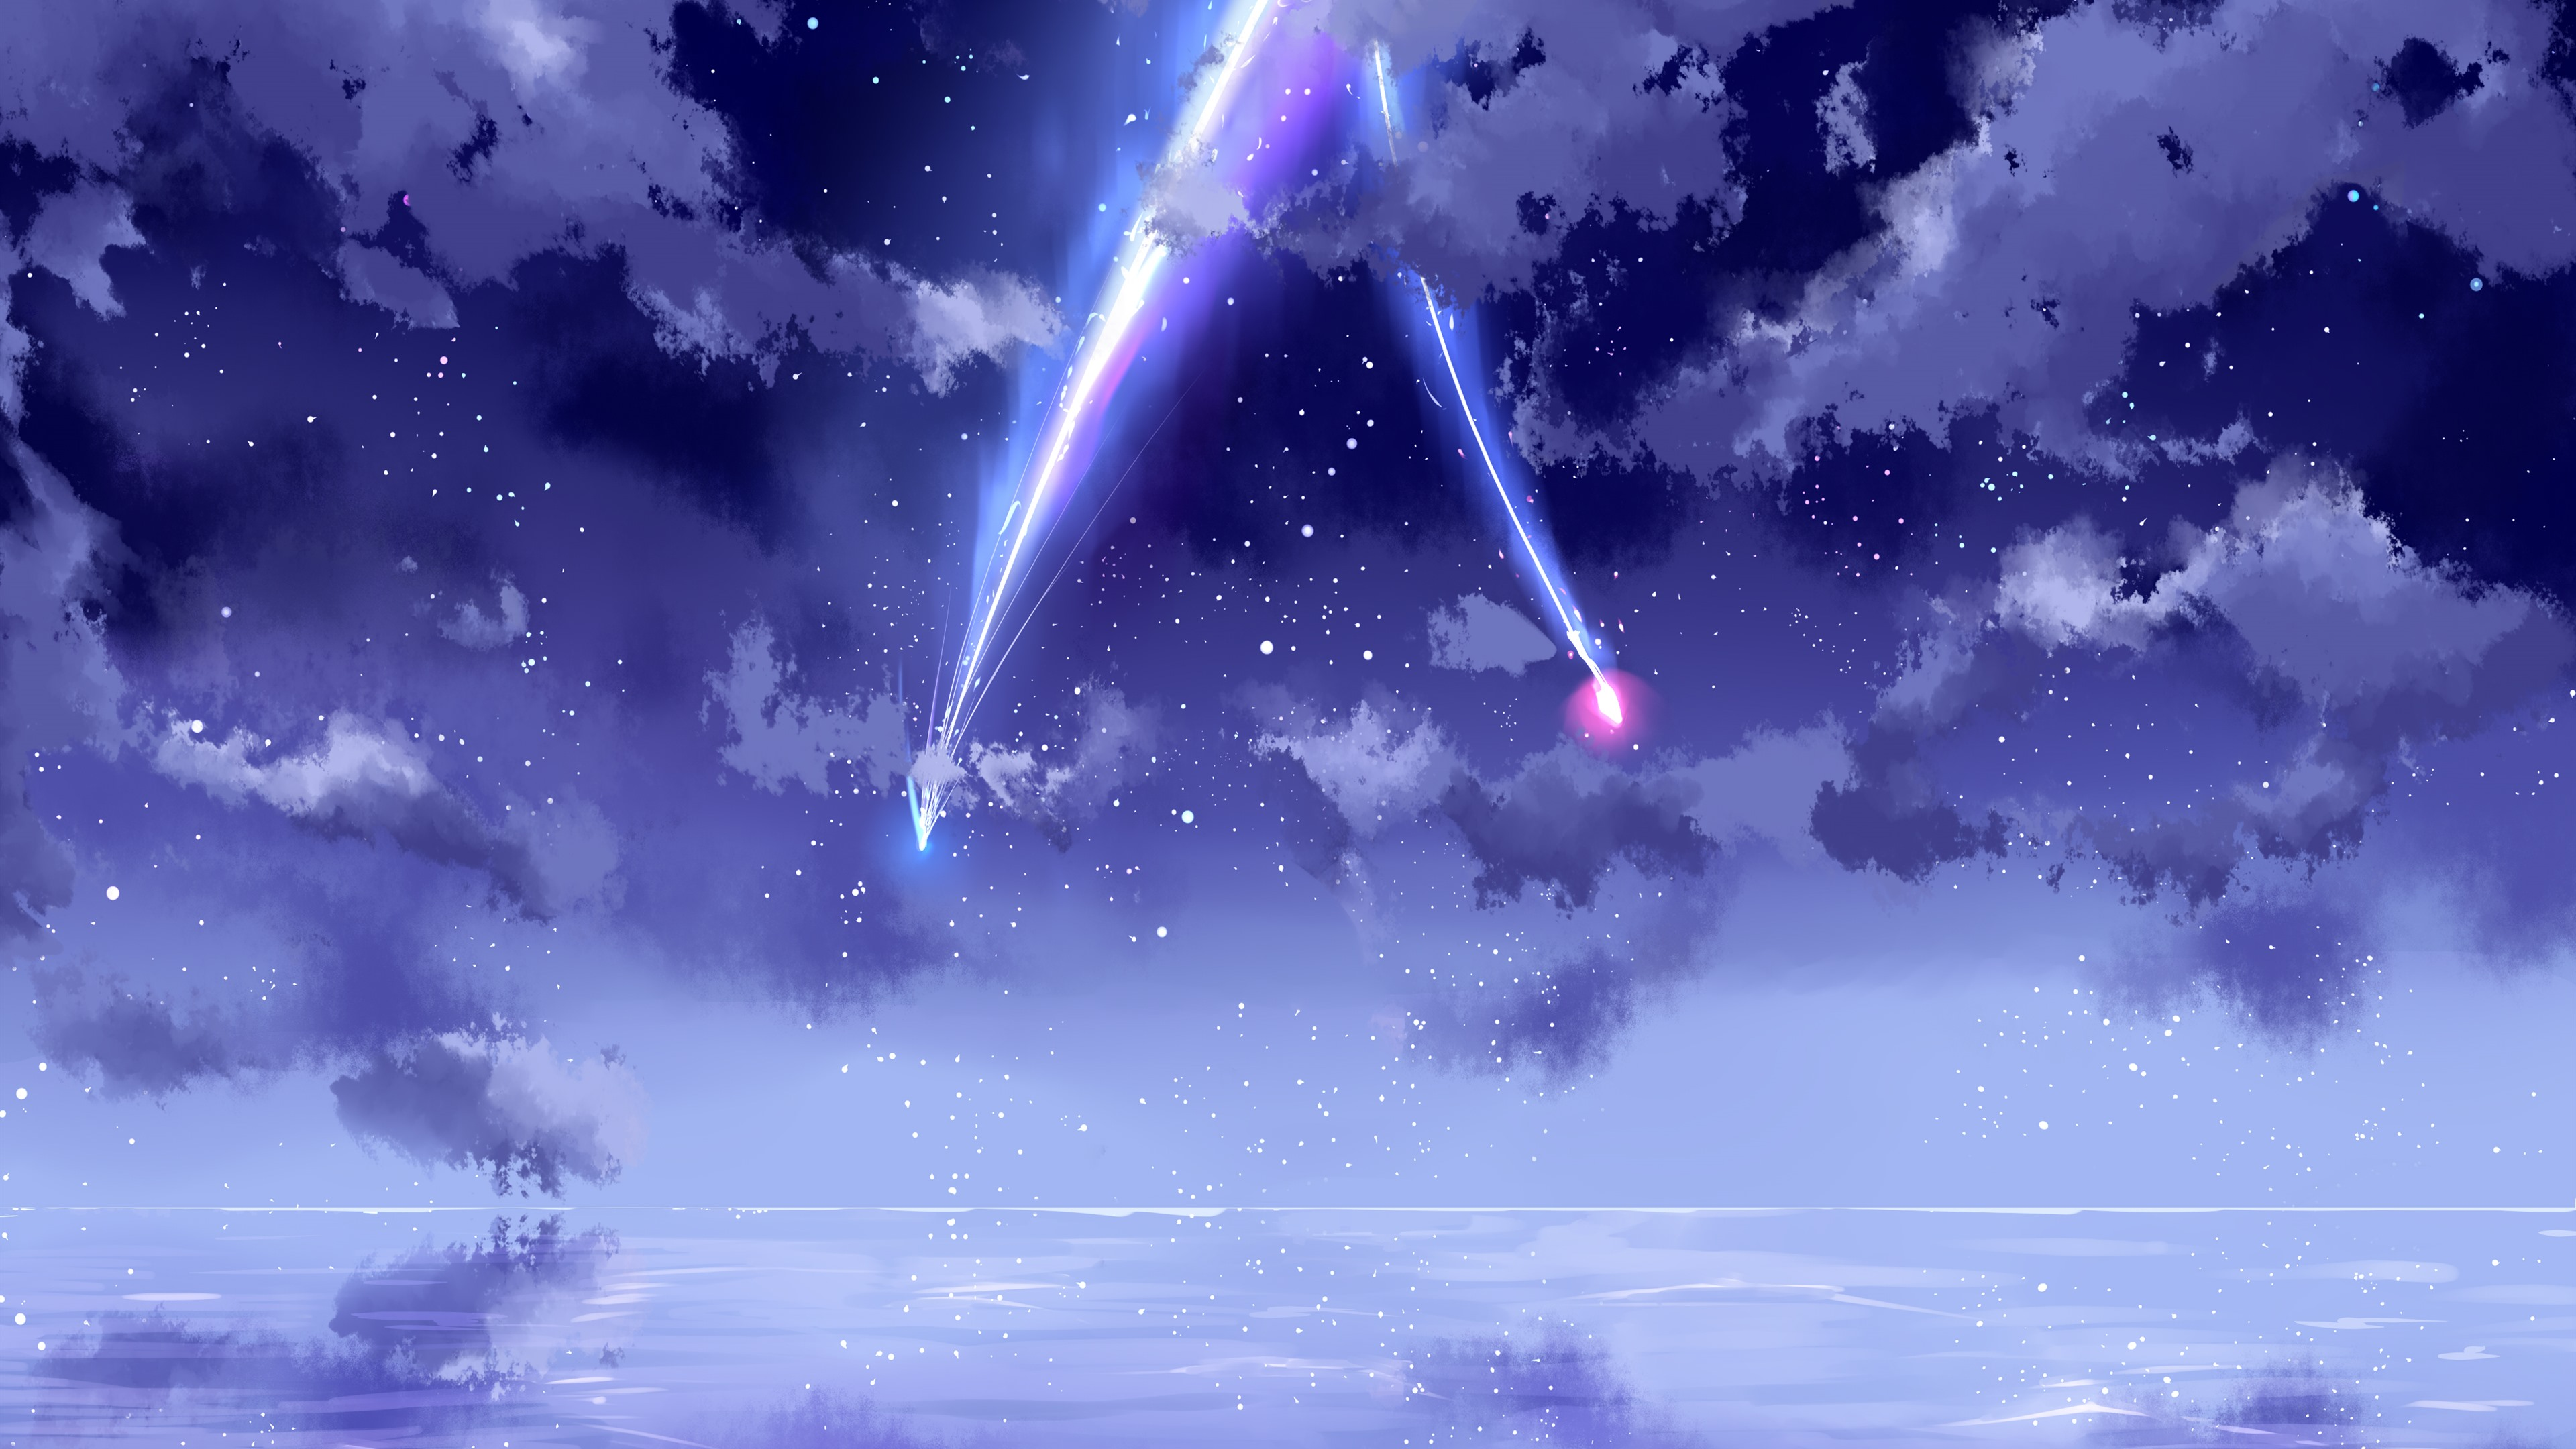 Wallpaper Your Name Beautiful Sky Meteor Anime 3840x2160